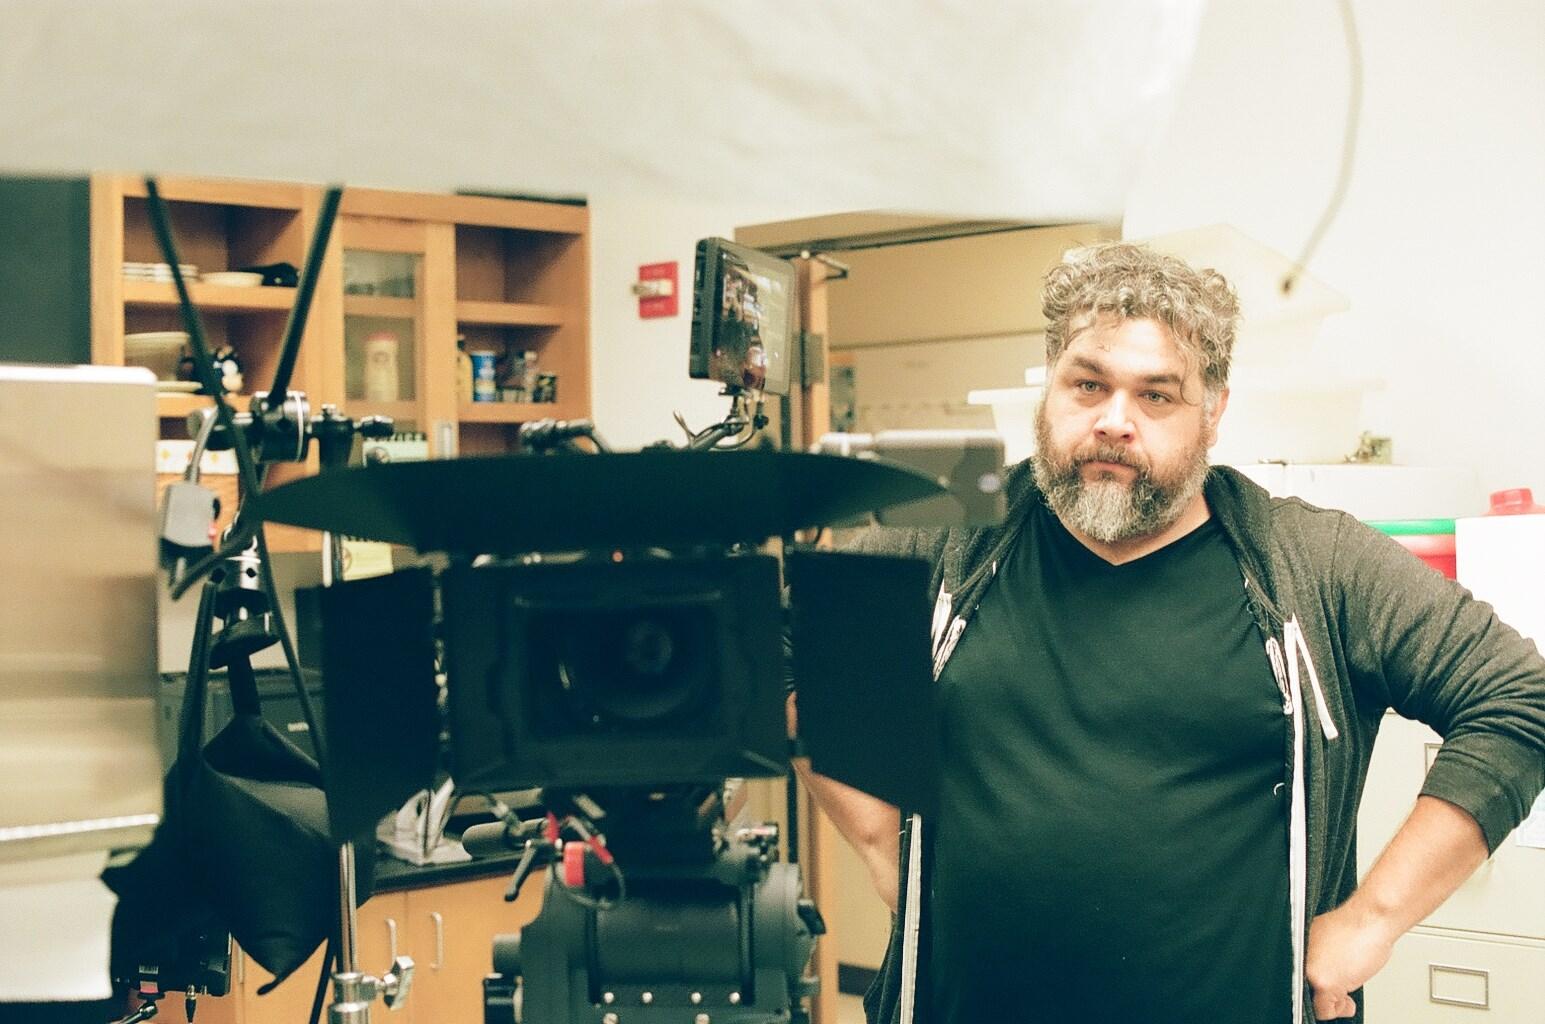 Ryan Castaneda Cinematographer / Photographer  https://ryancastaneda.myportfolio.com/